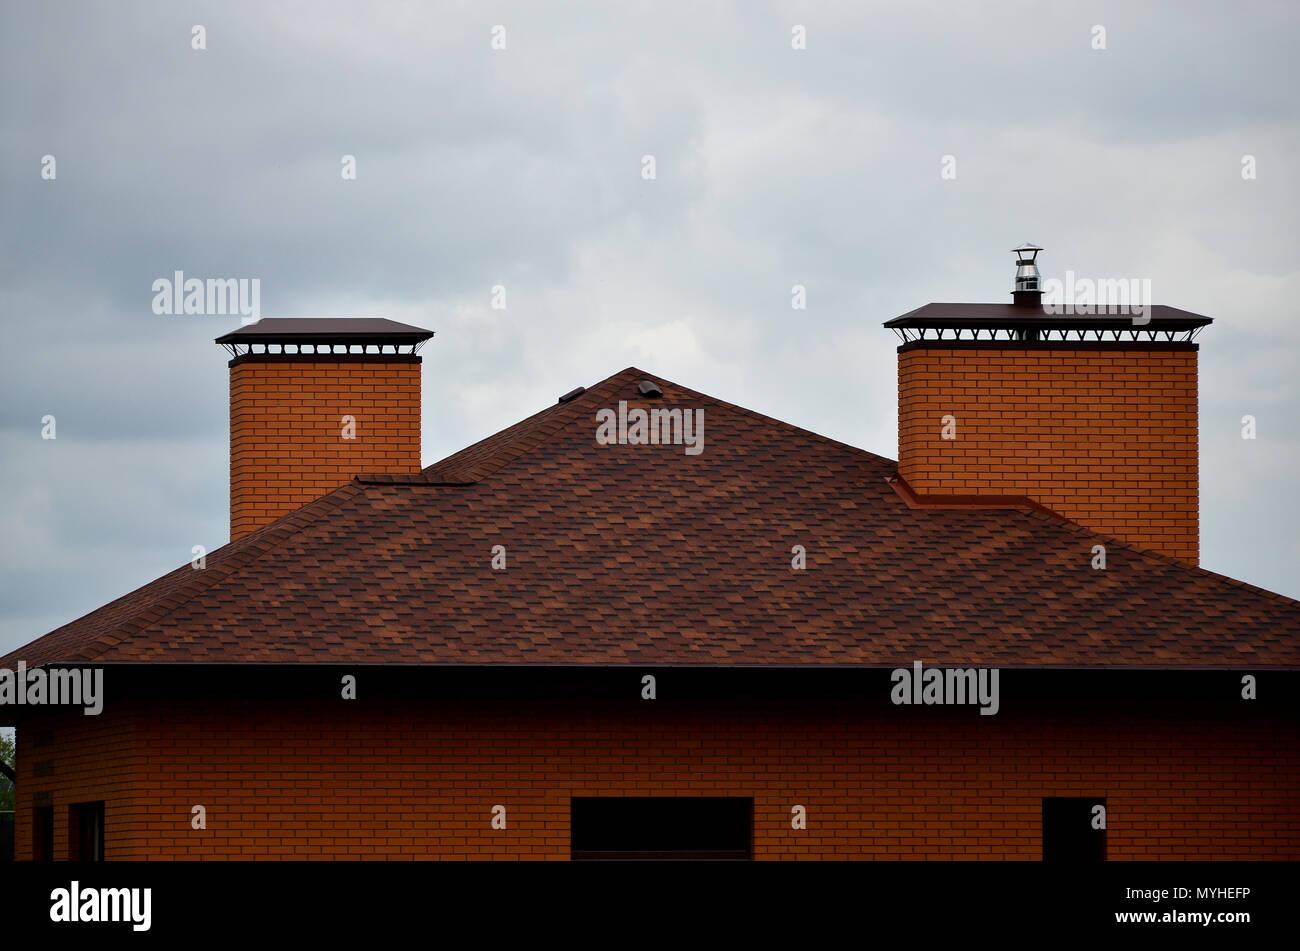 detail roof shingles chimney stockfotos detail roof. Black Bedroom Furniture Sets. Home Design Ideas